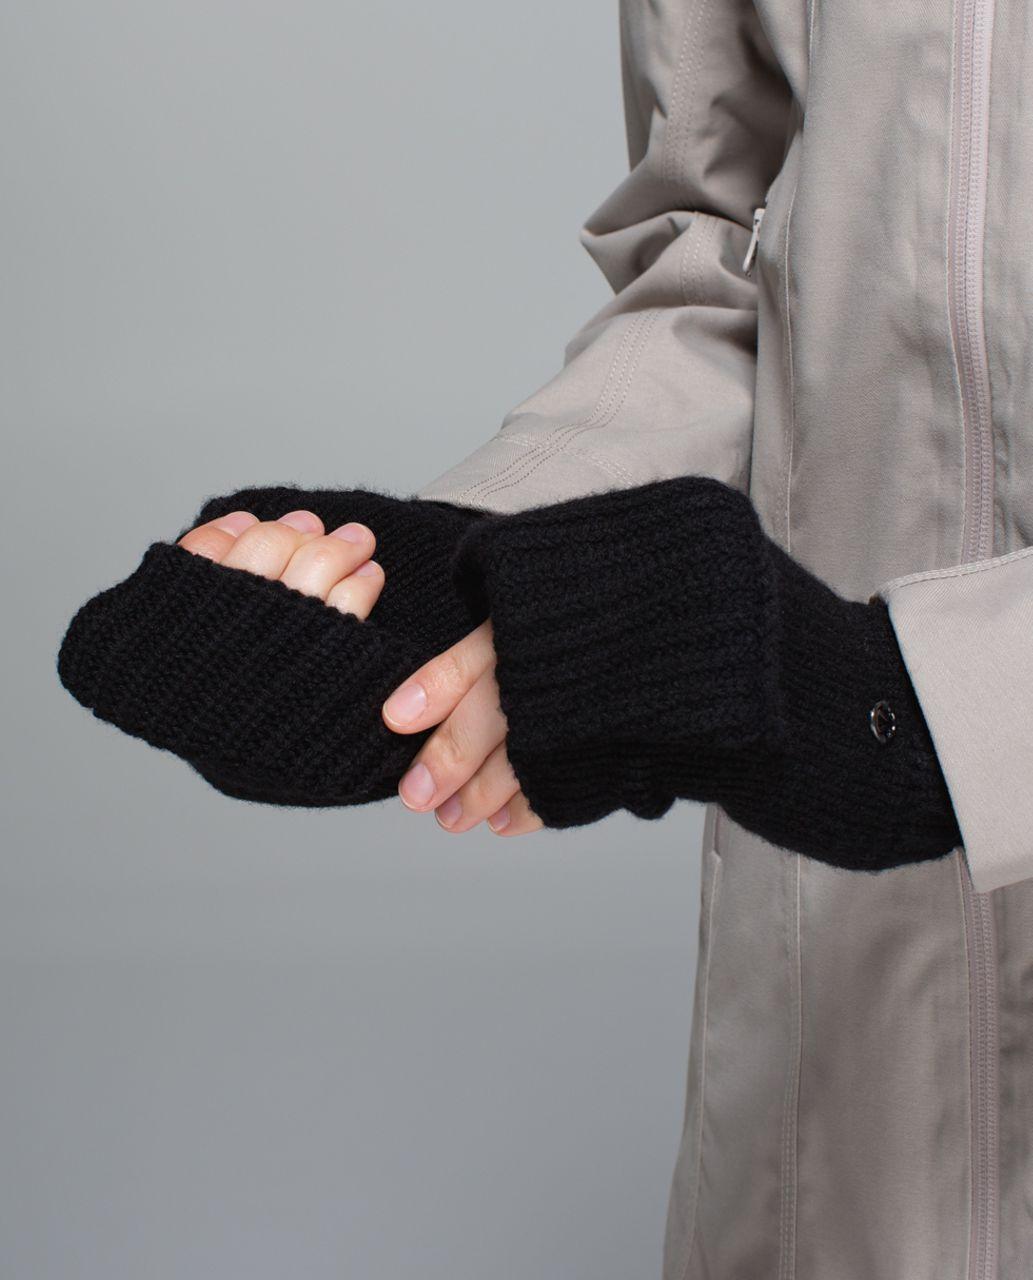 Lululemon Happy Yogi Hand Warmers - Heathered Black /  Black